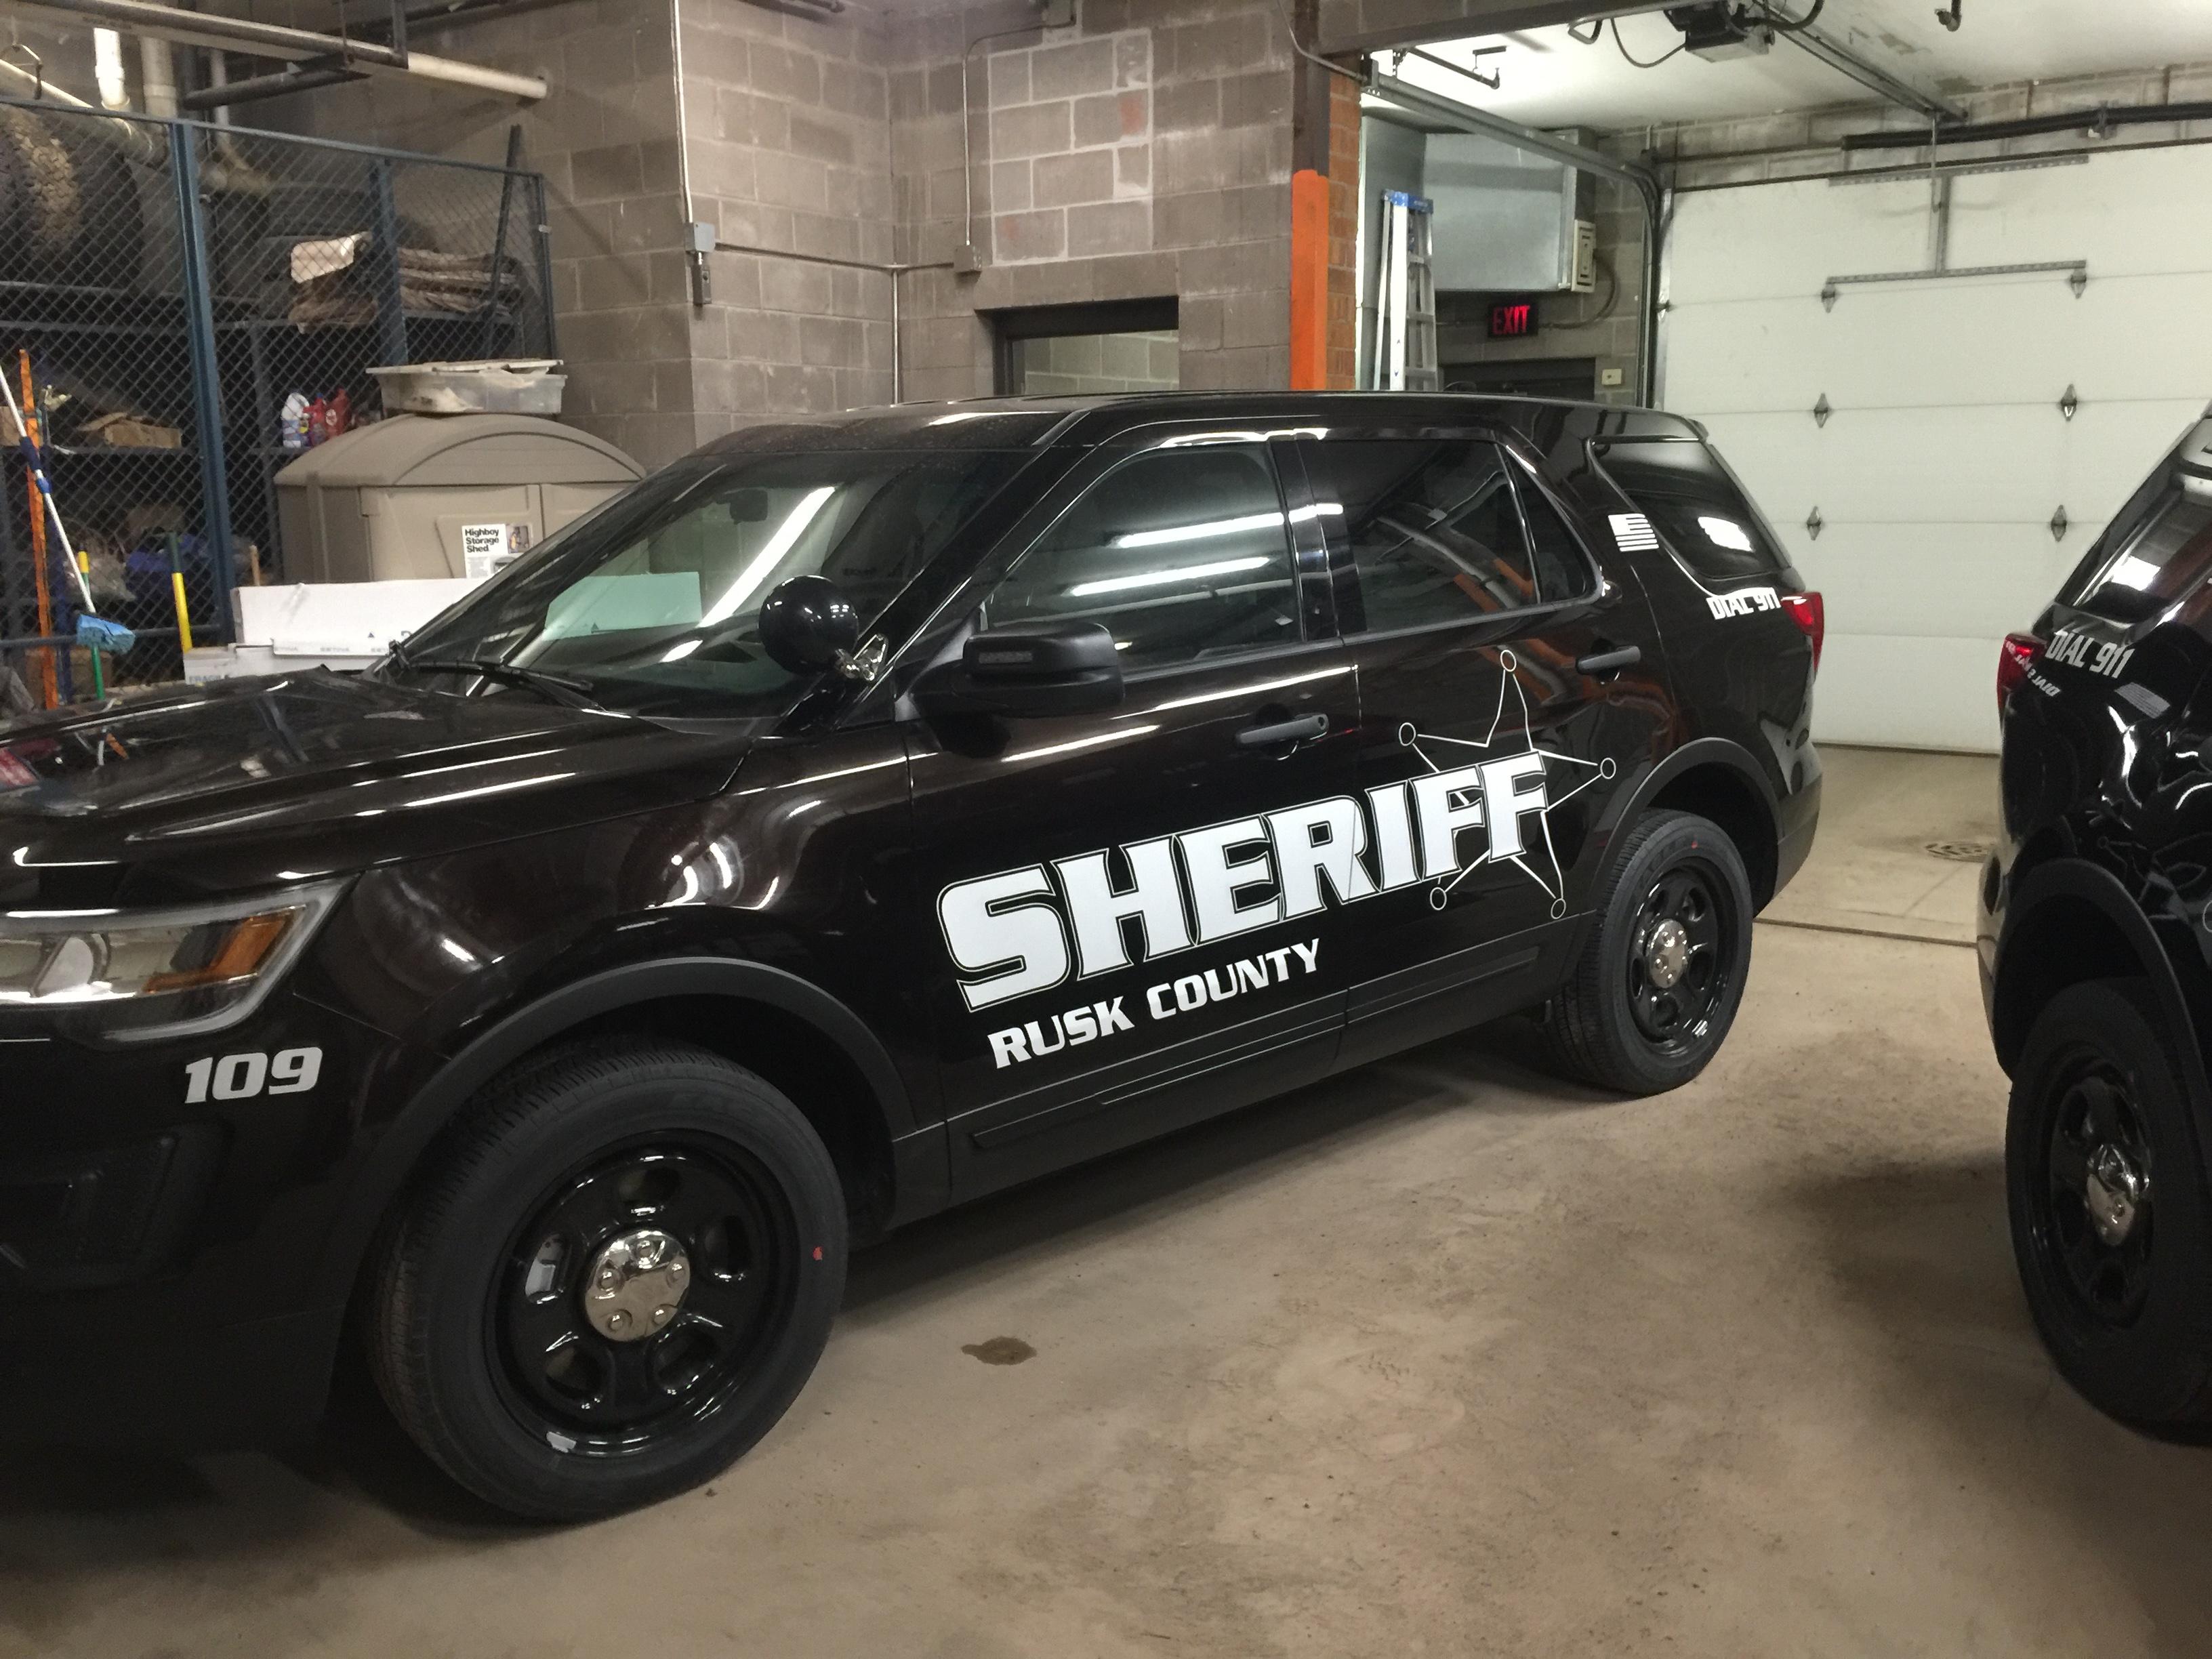 Rusk County Sheriff